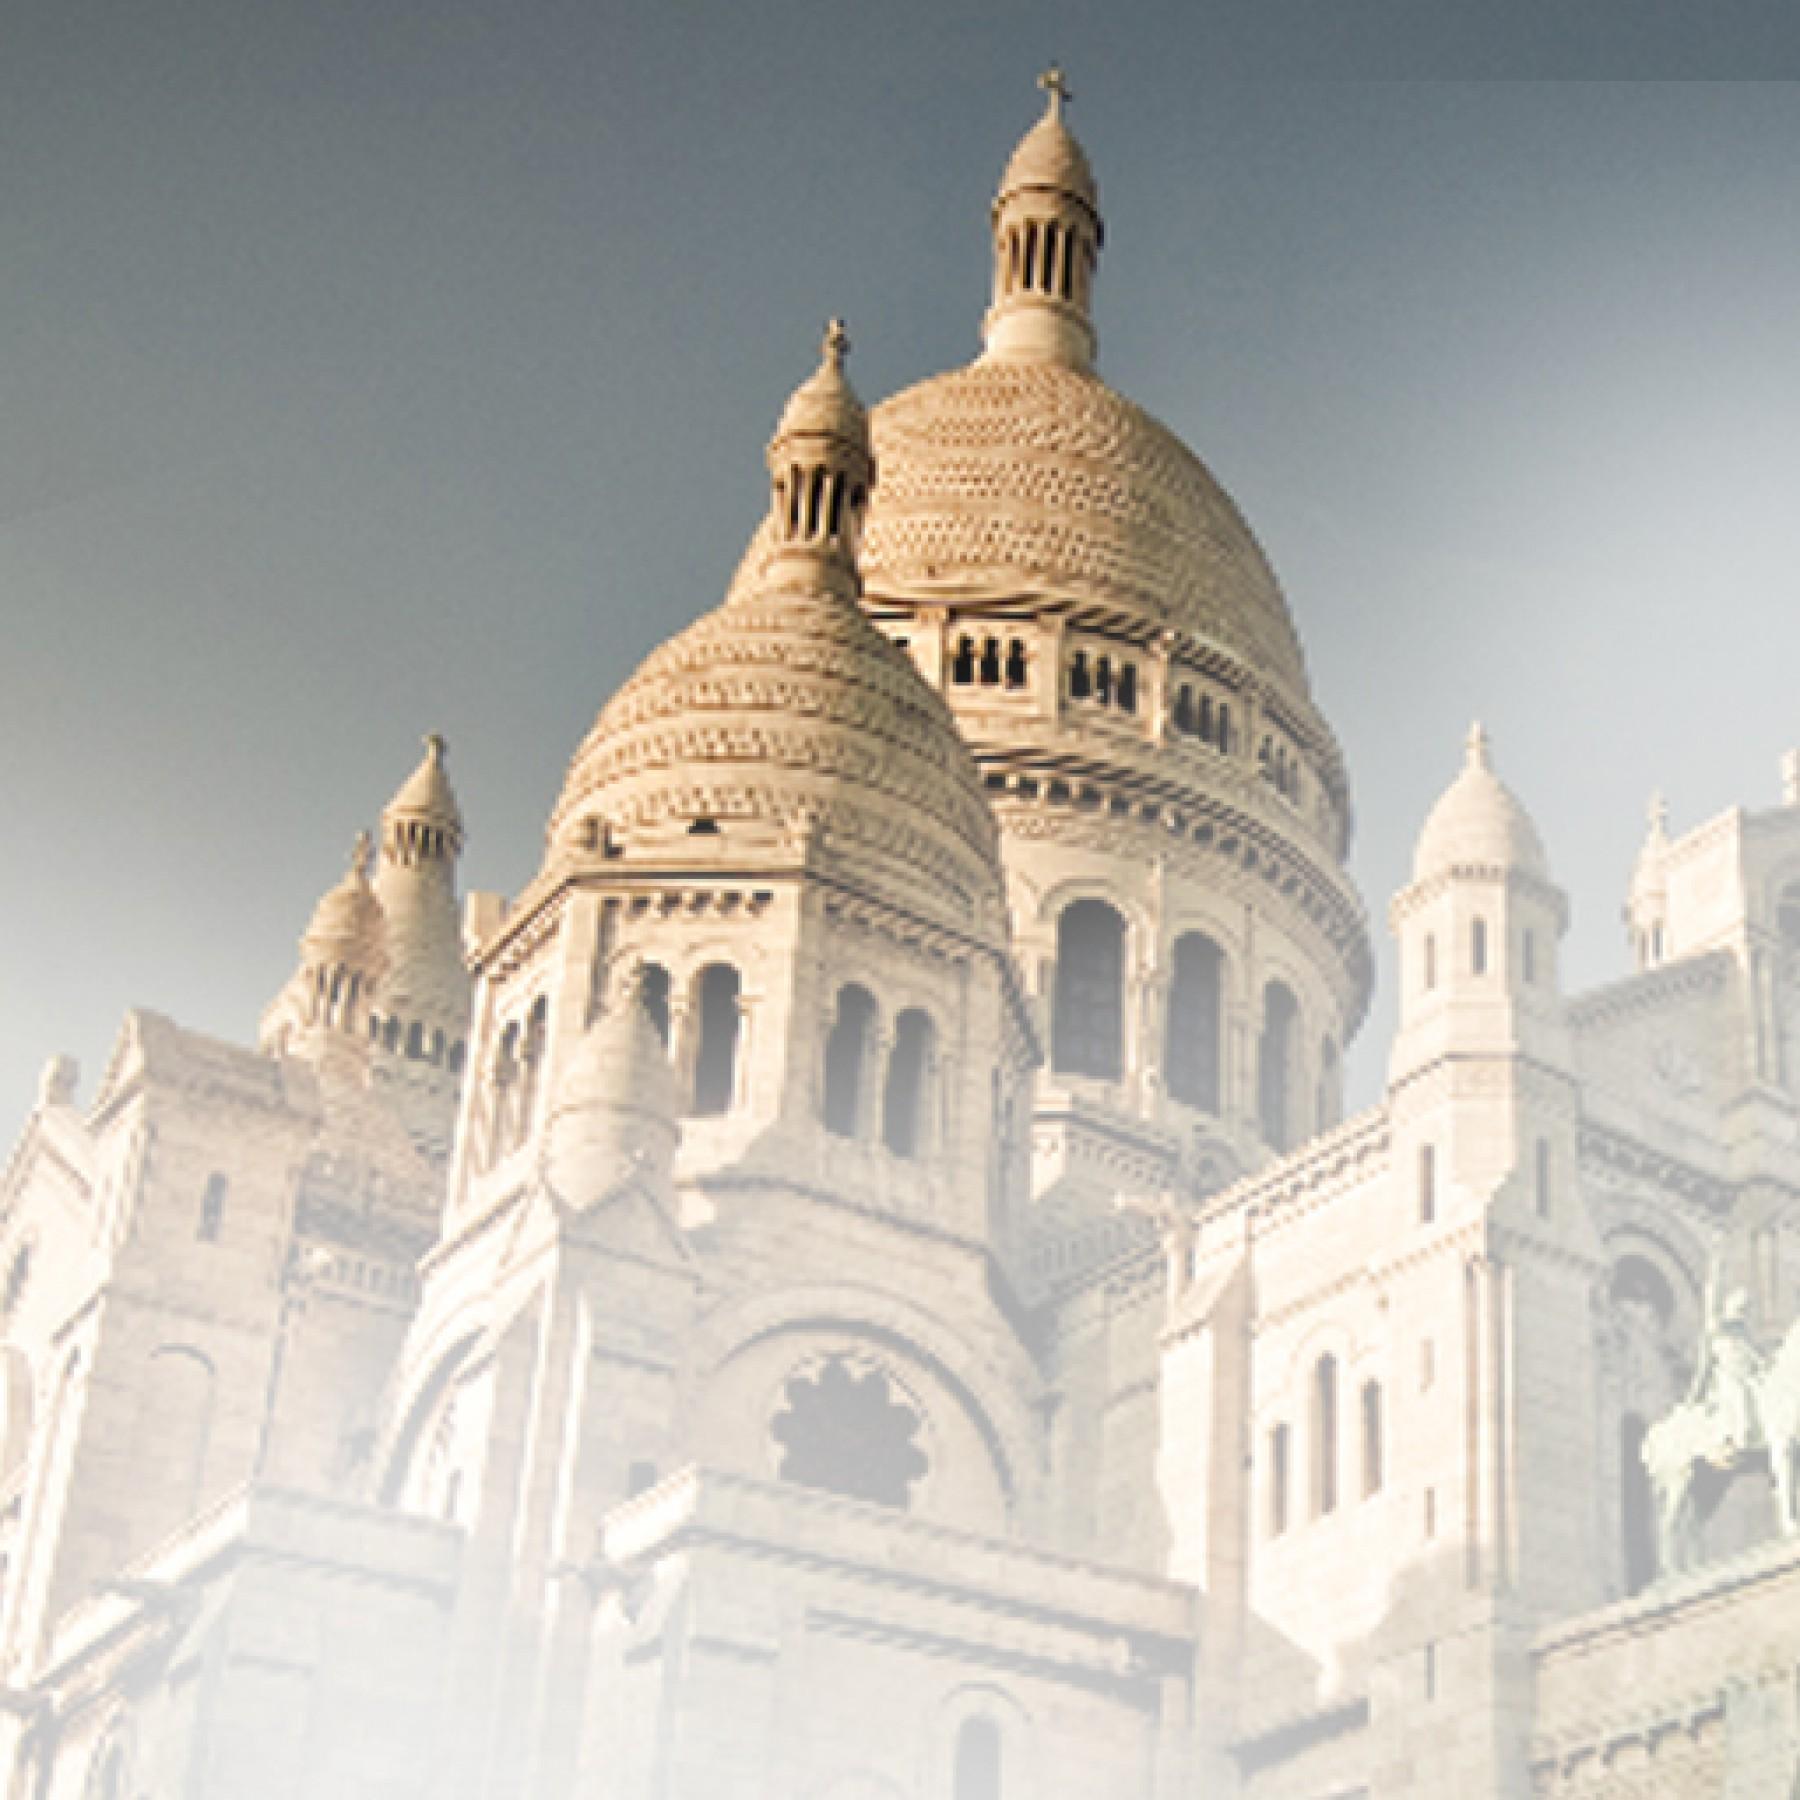 sacre-coeur-travel-adults-main-location1